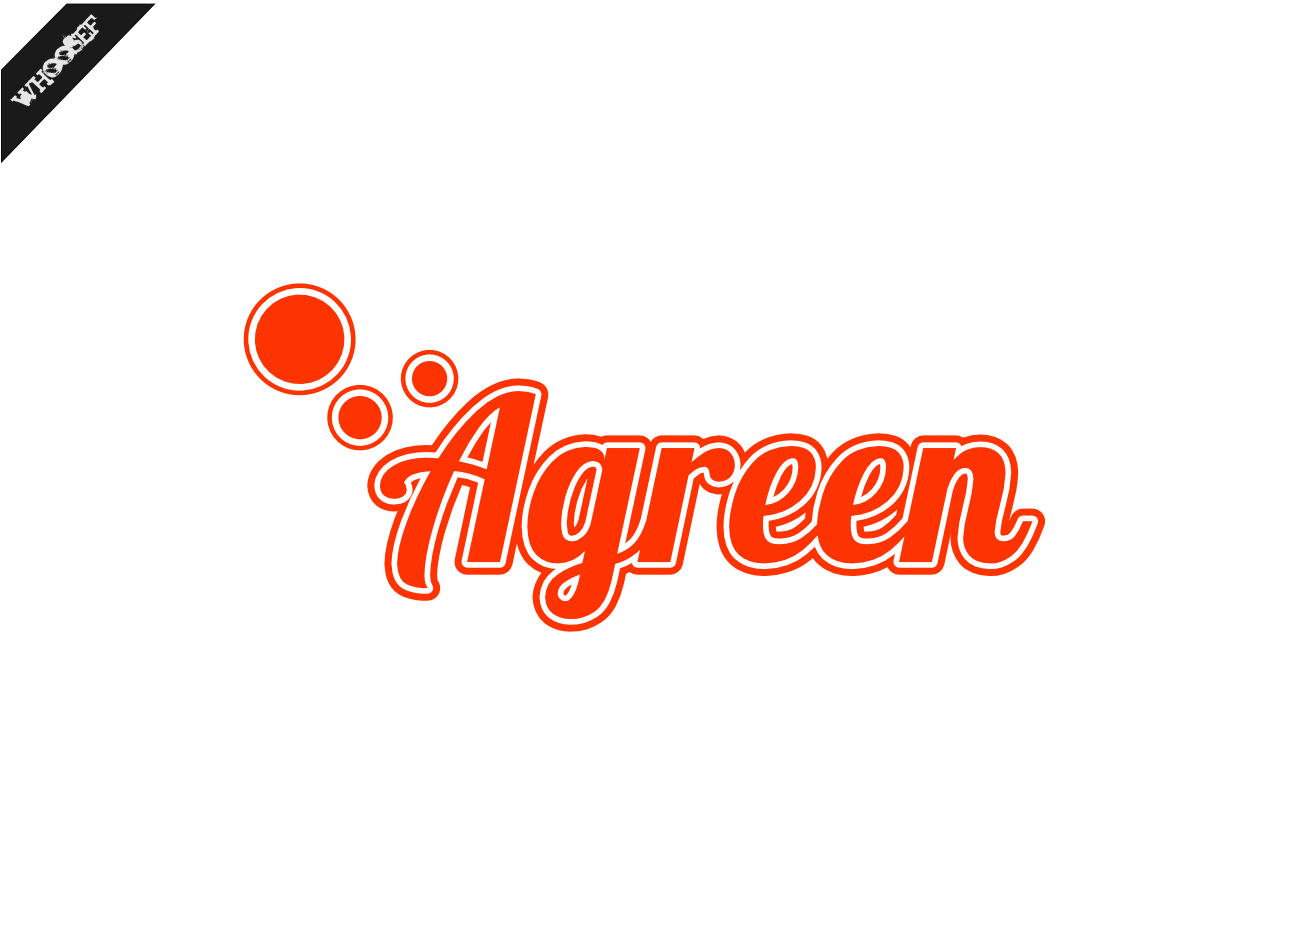 Logo Design by whoosef - Entry No. 110 in the Logo Design Contest Inspiring Logo Design for Agreen.